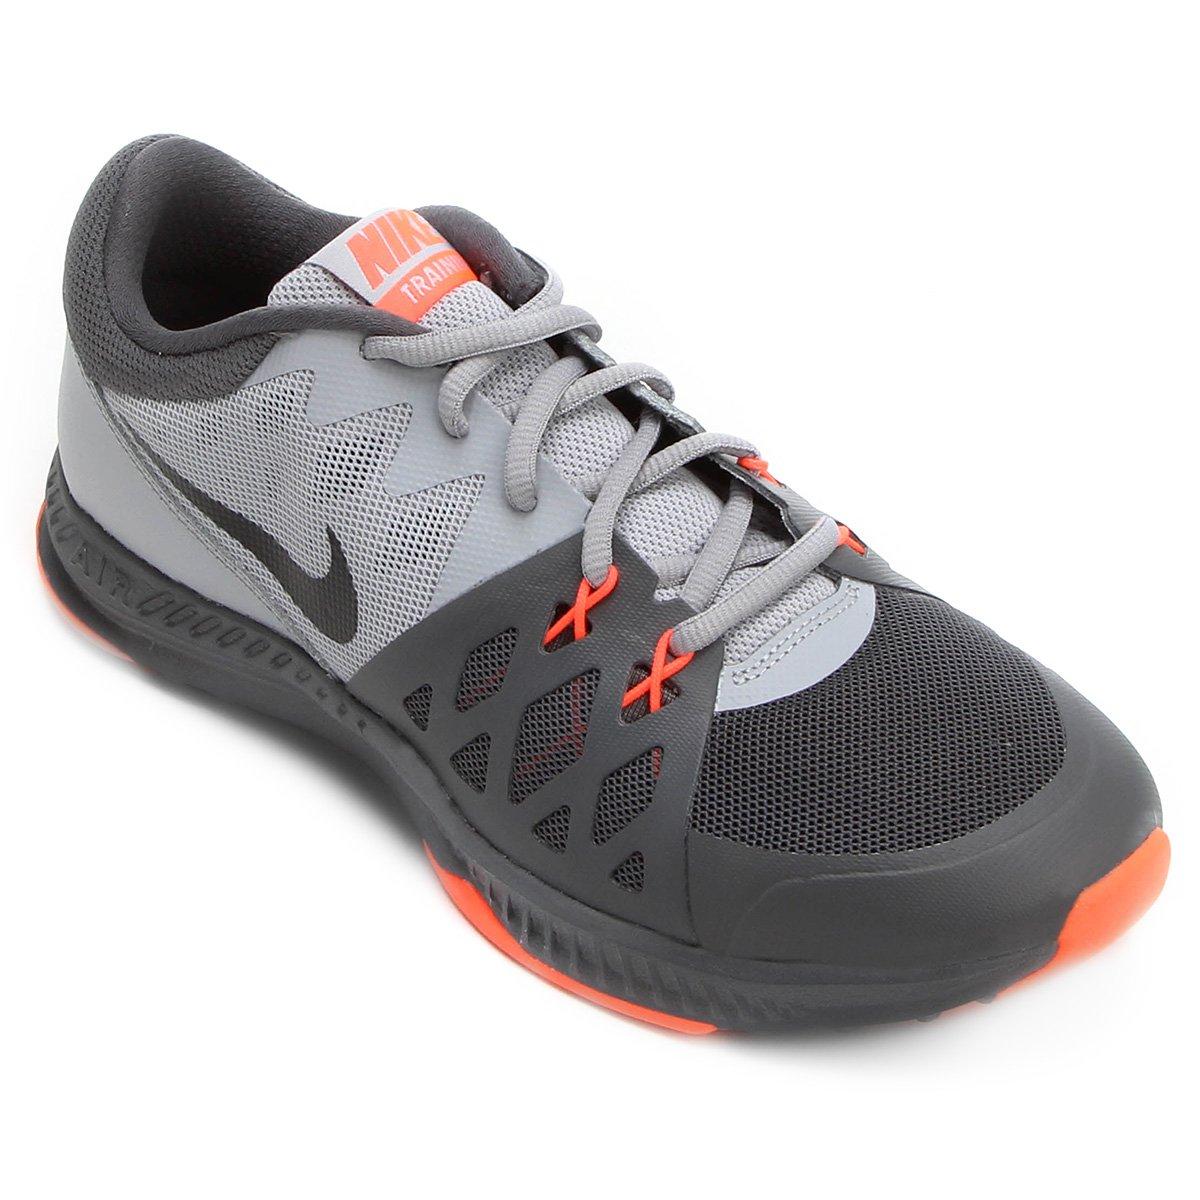 a90932acdca Tênis Nike Air Epic Speed TR 2 Masculino - Compre Agora